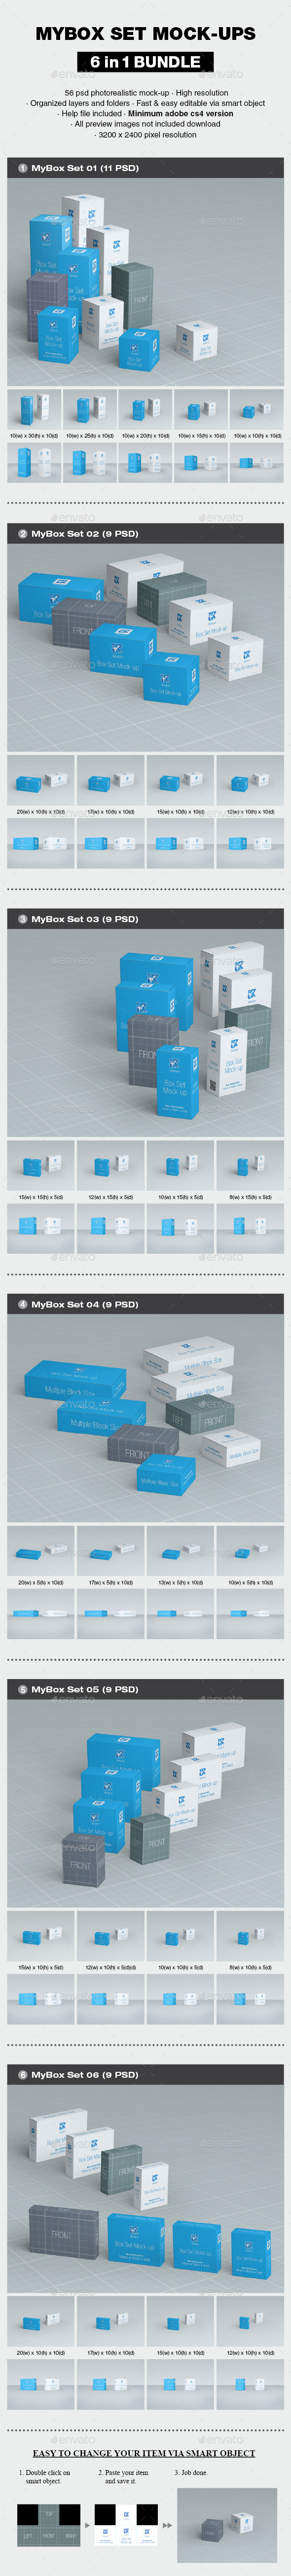 MyBox Set Mock-up Bundle - Packaging Product Mock-Ups